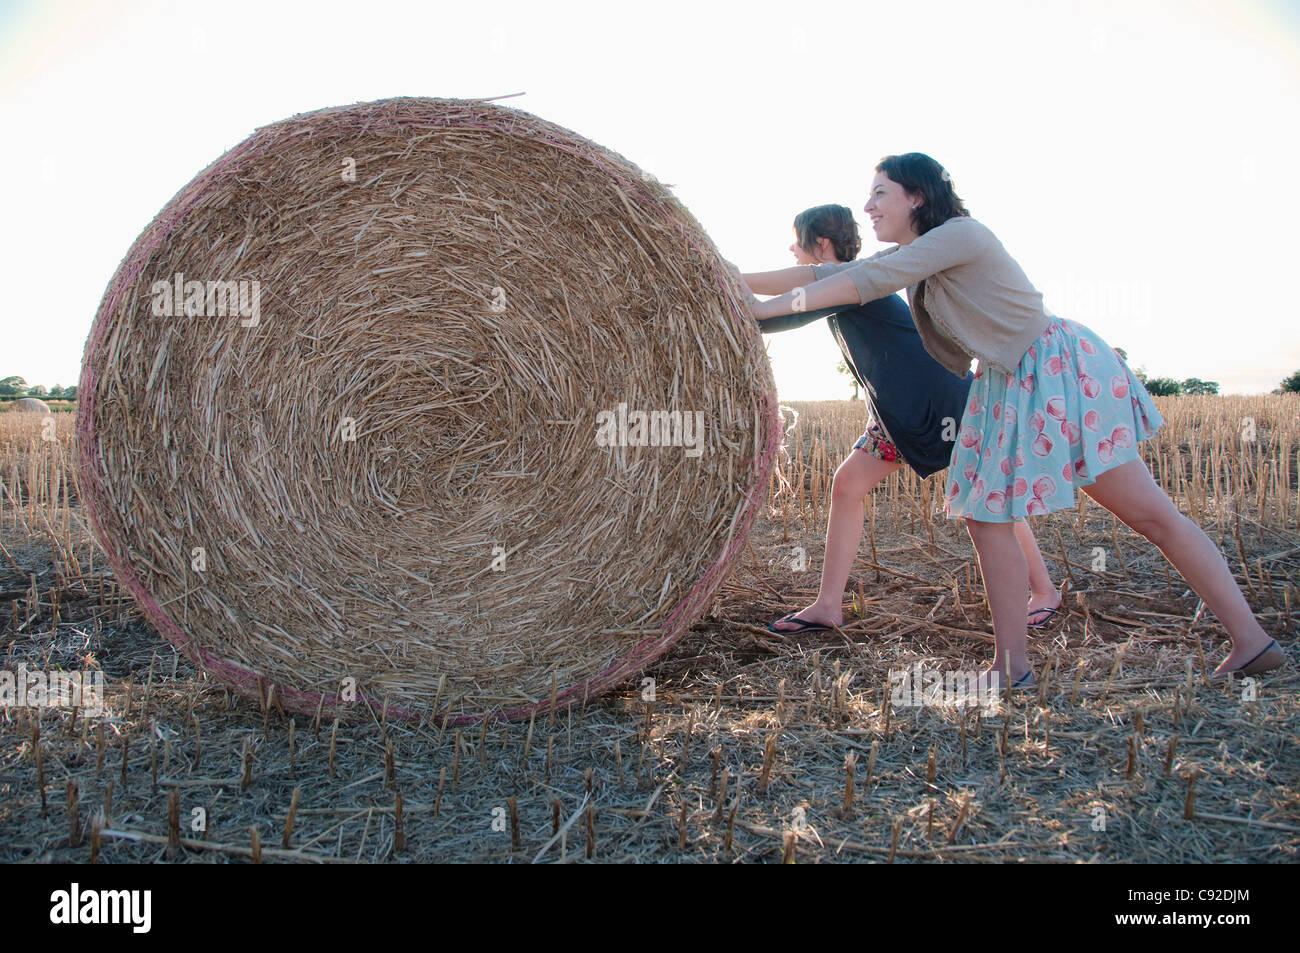 Girls pushing hay bale in field - Stock Image